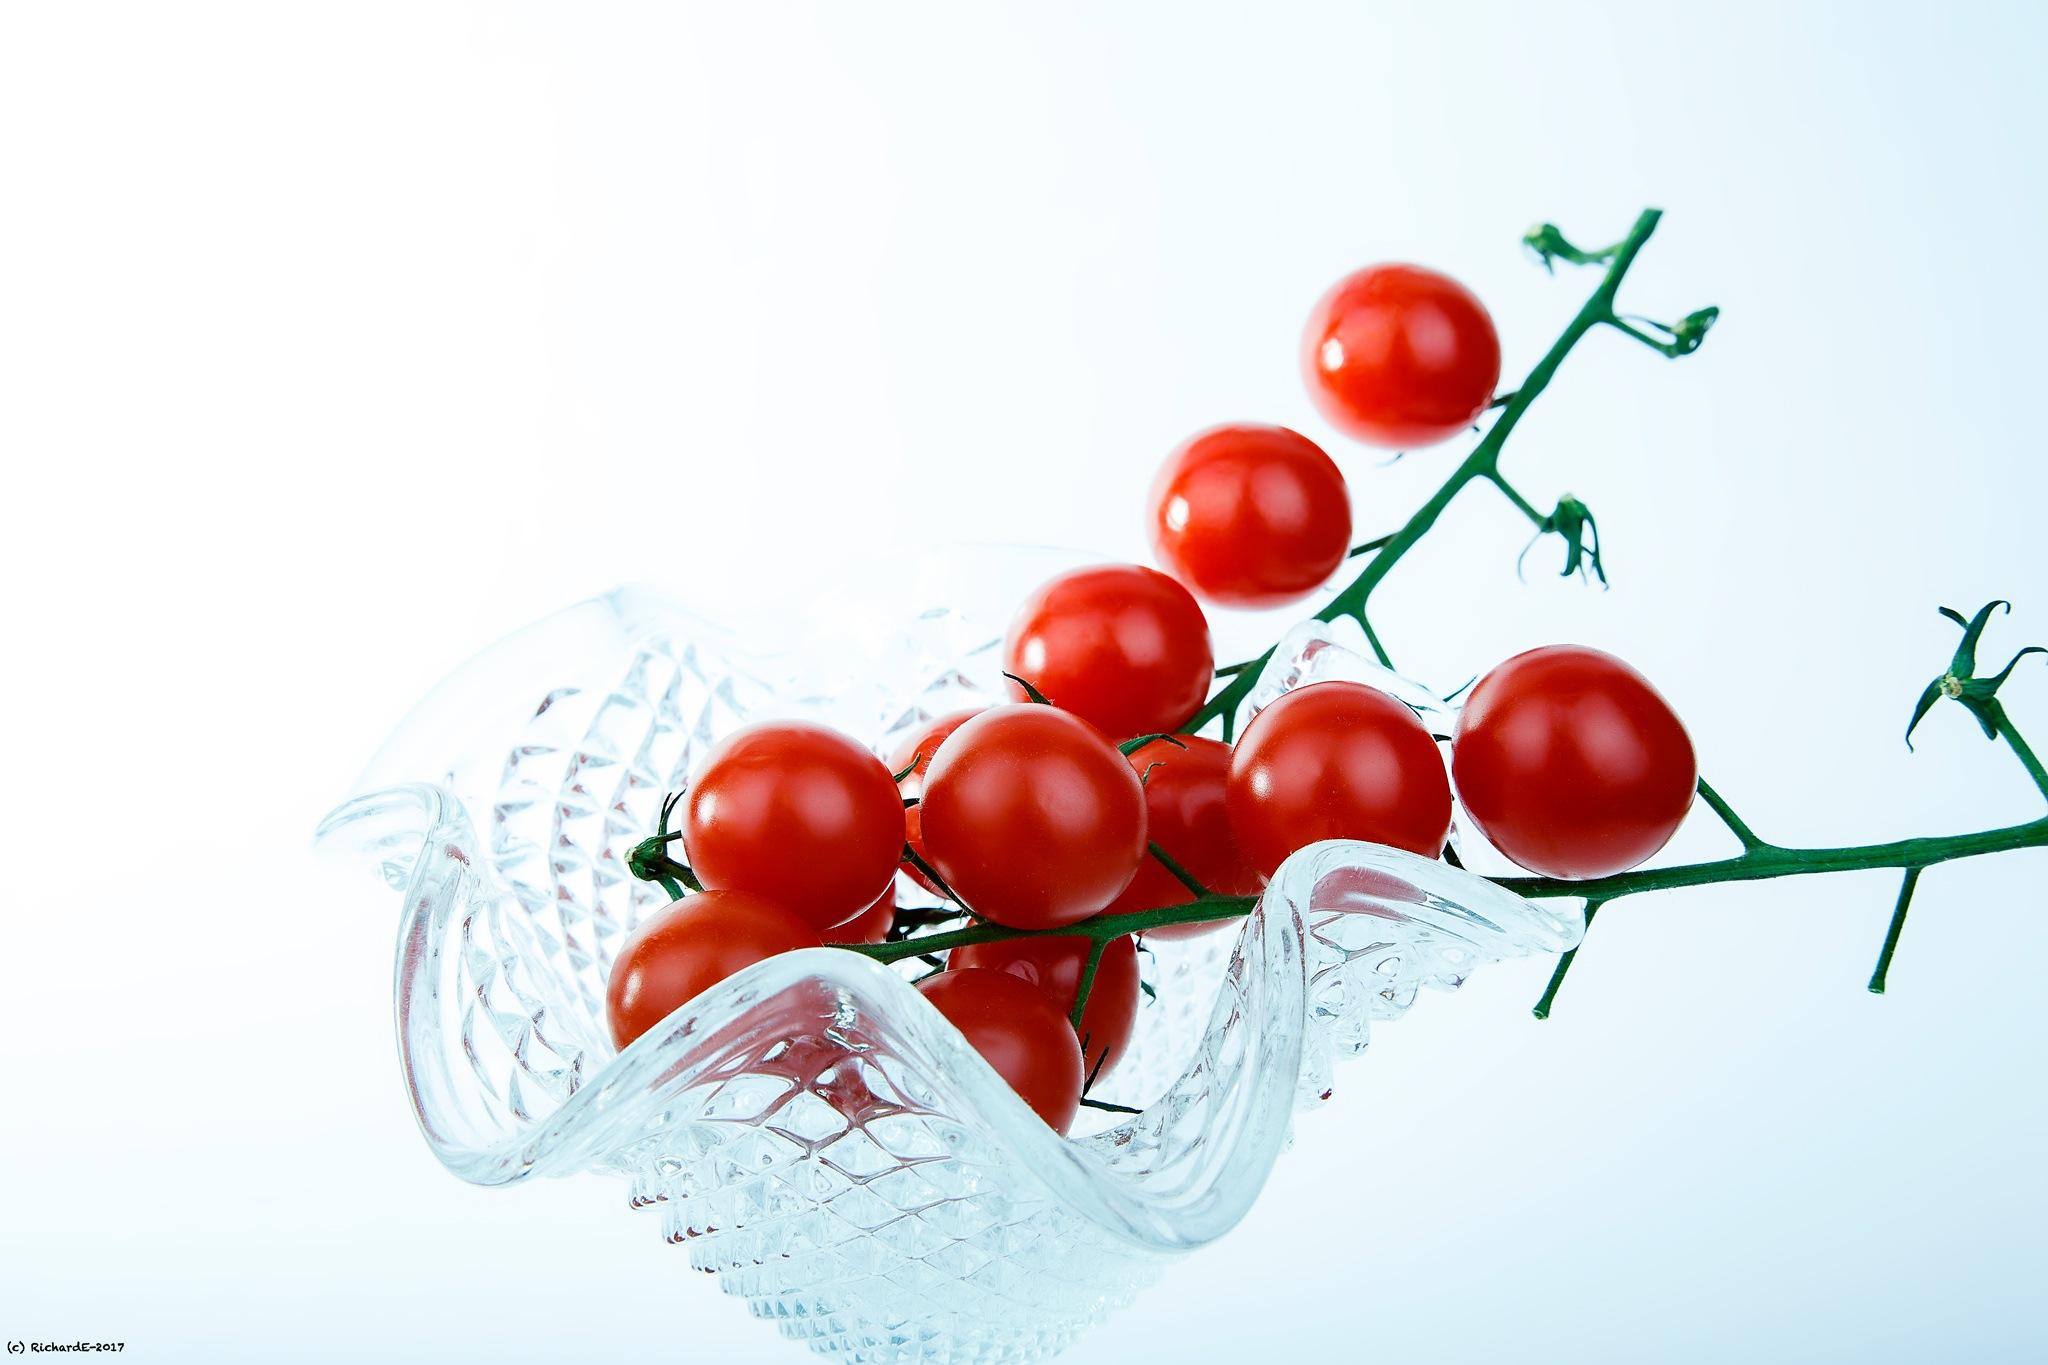 Tomatoes by Richard E Foto